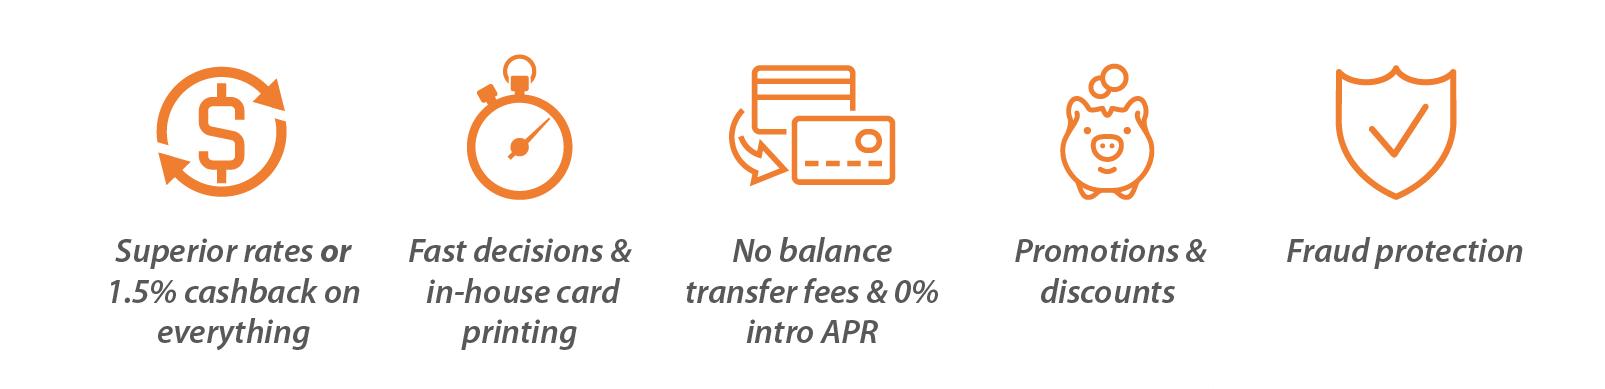 Northern Credit Union Card Benefits